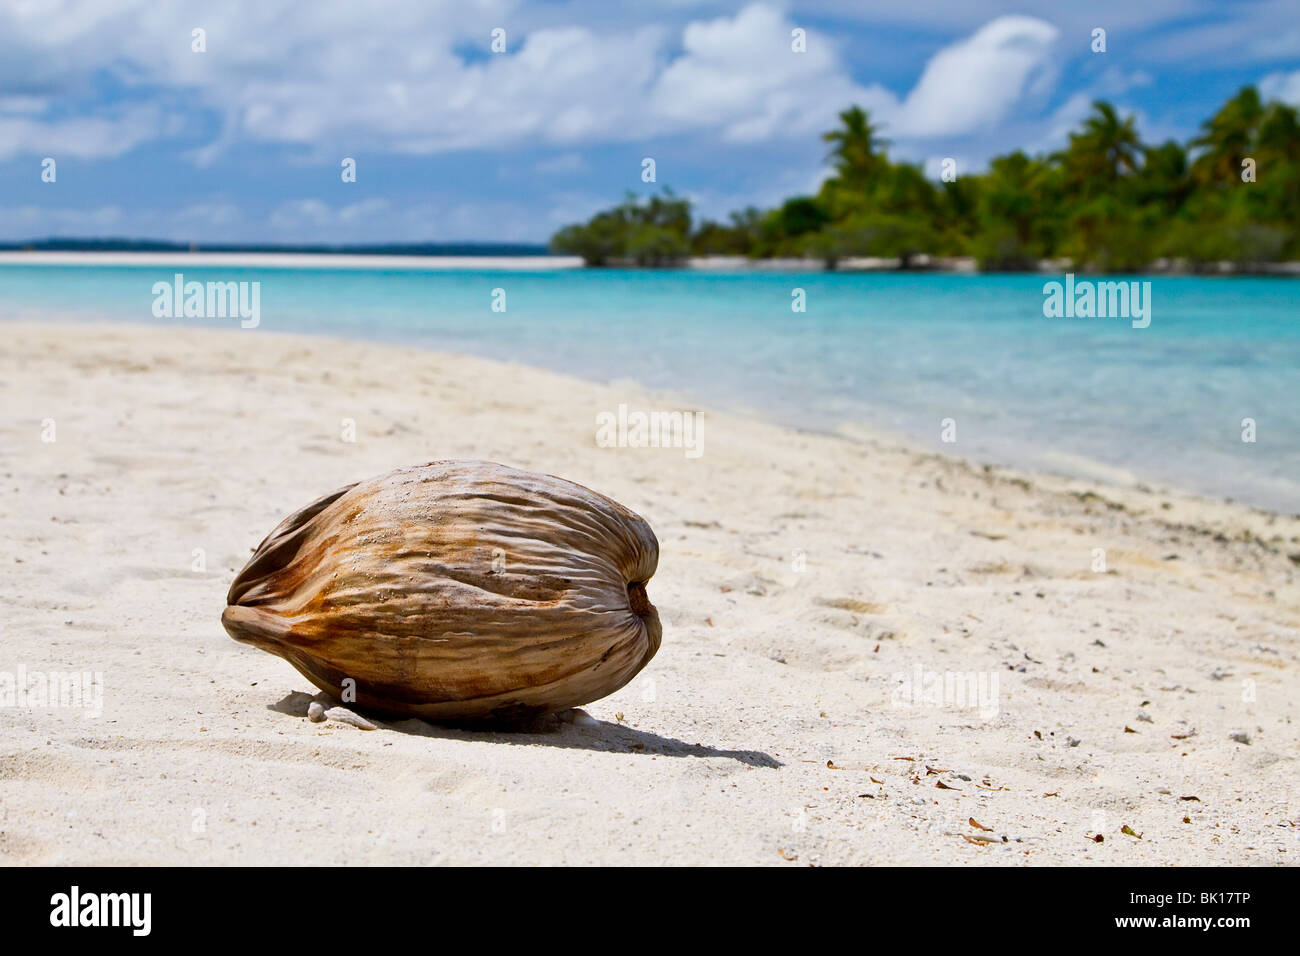 Coconut on beach - Stock Image